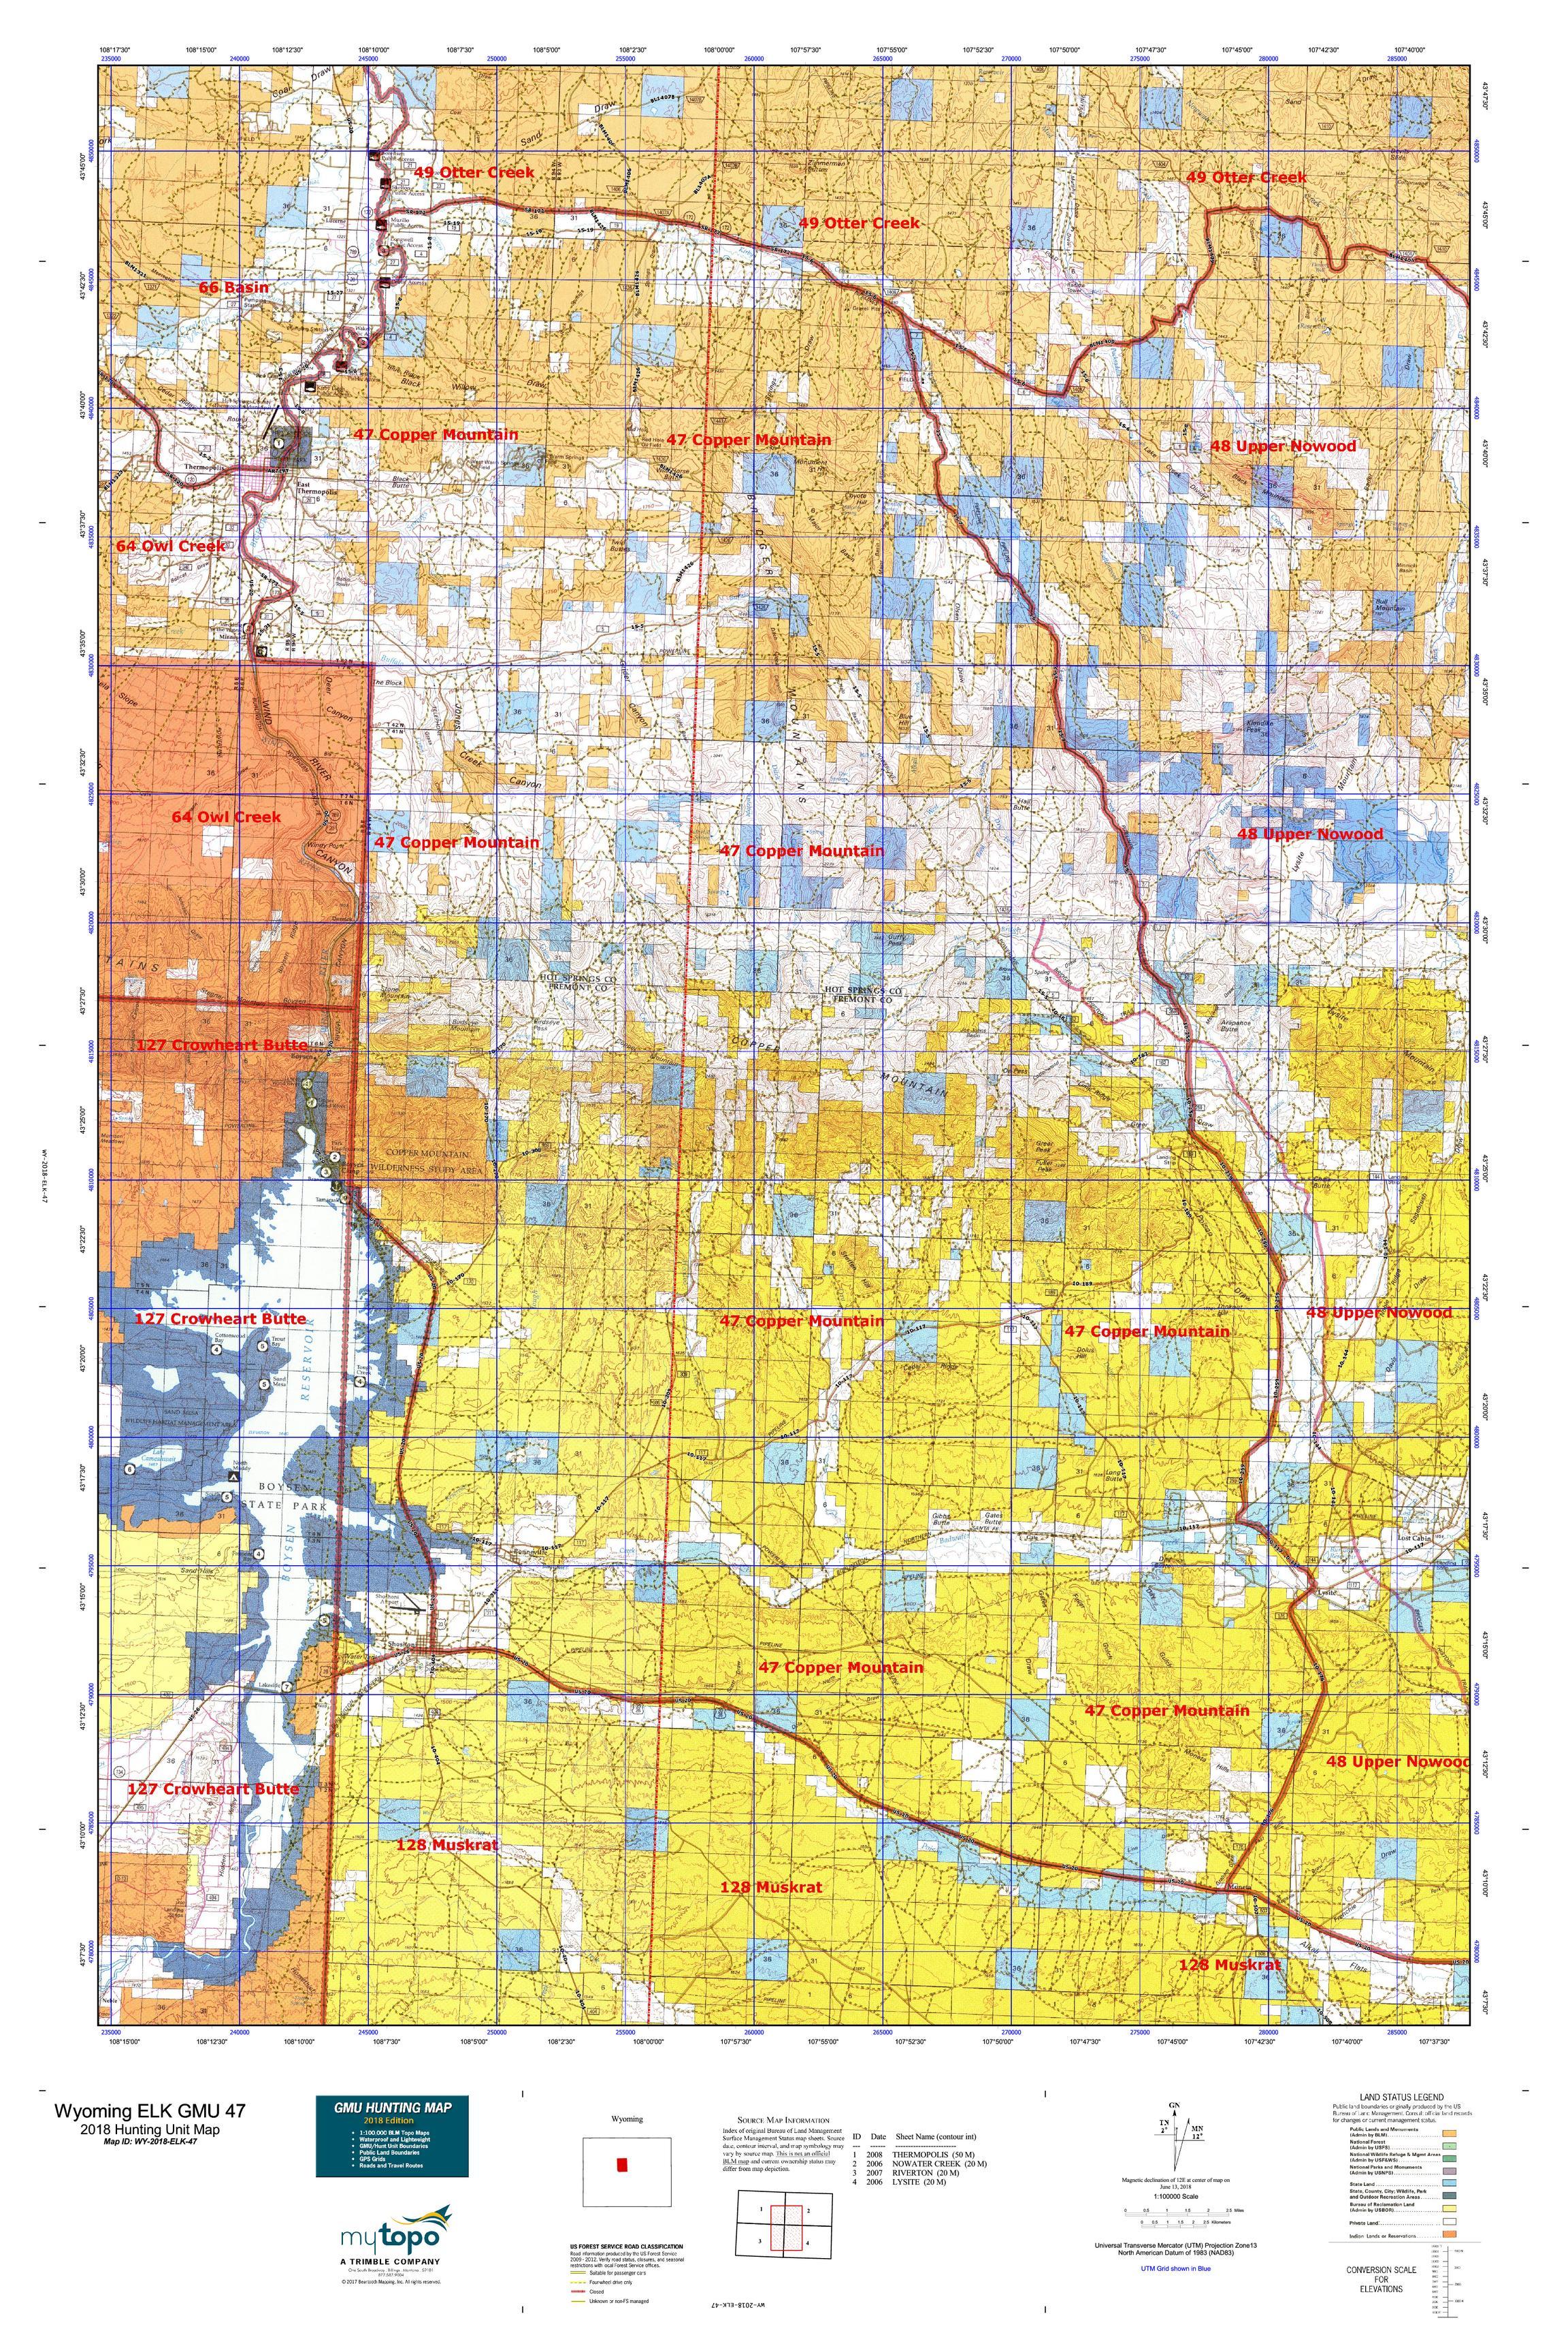 Wyoming ELK GMU 47 Map   MyTopo